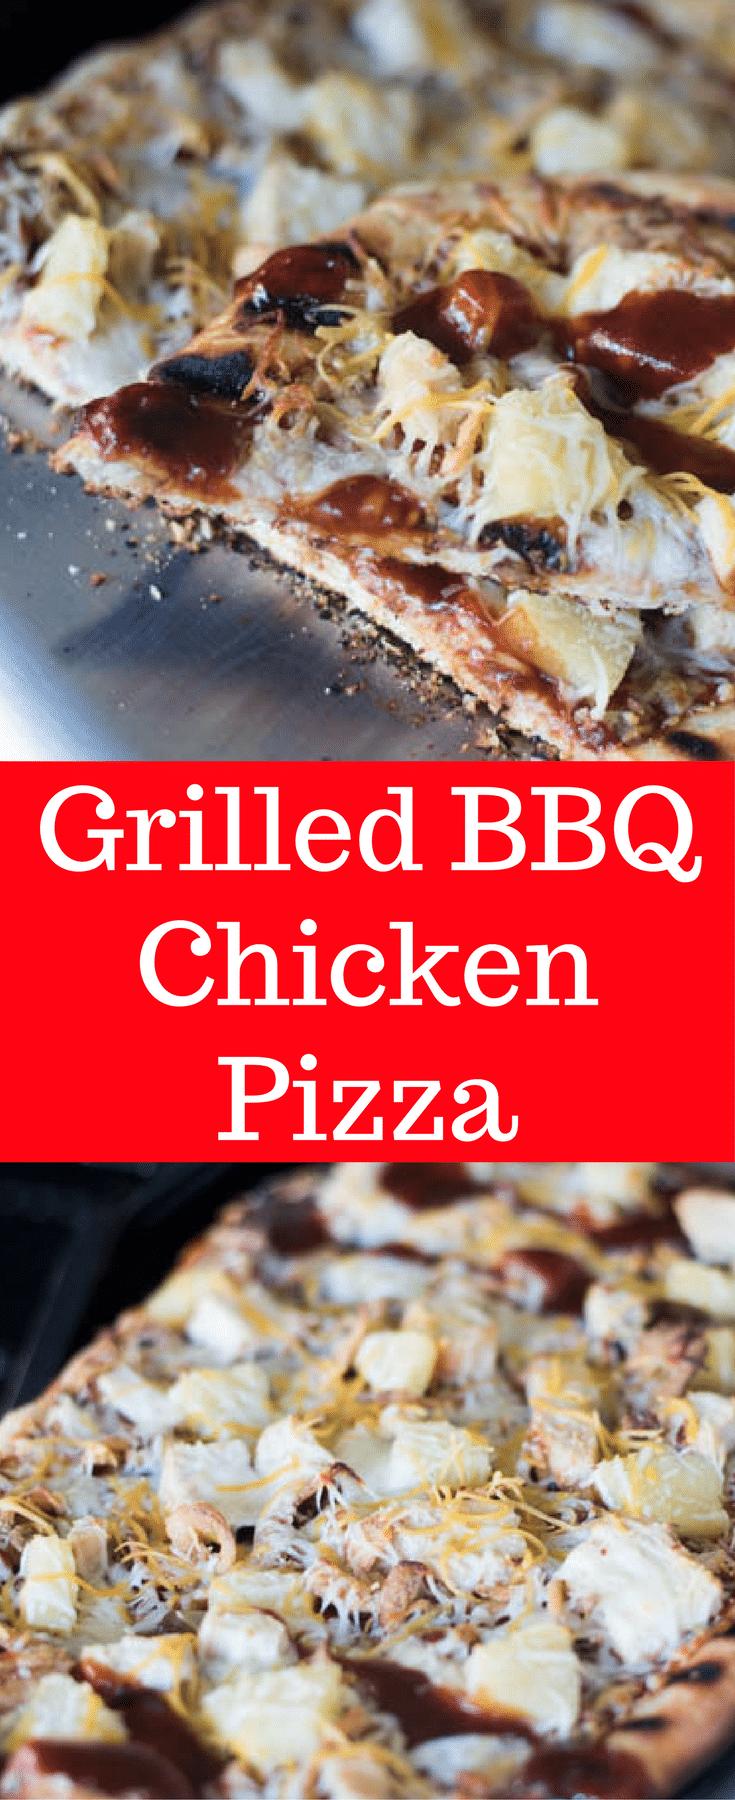 Grilled BBQ Chicken Pizza / BBQ Chicken pizza / BBQ Pizza / Grilled Pizza Ideas / Grilled Pizza Toppings